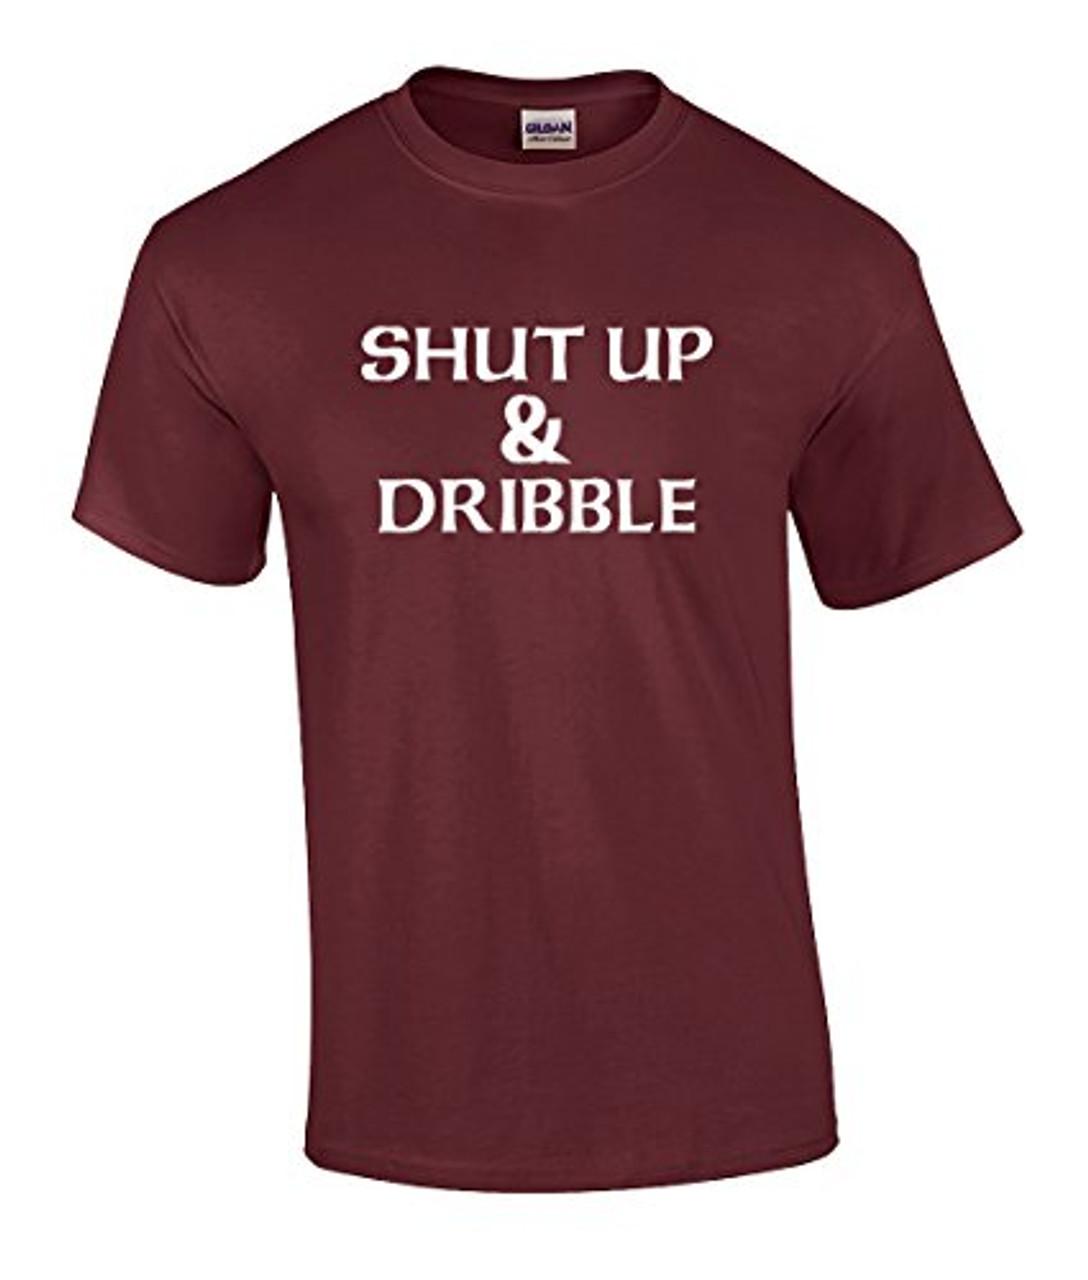 0c9dfcfa0 Funny Political Basketball Shut Up and Dribble Graphic T-shirt - Trenz Shirt  Company